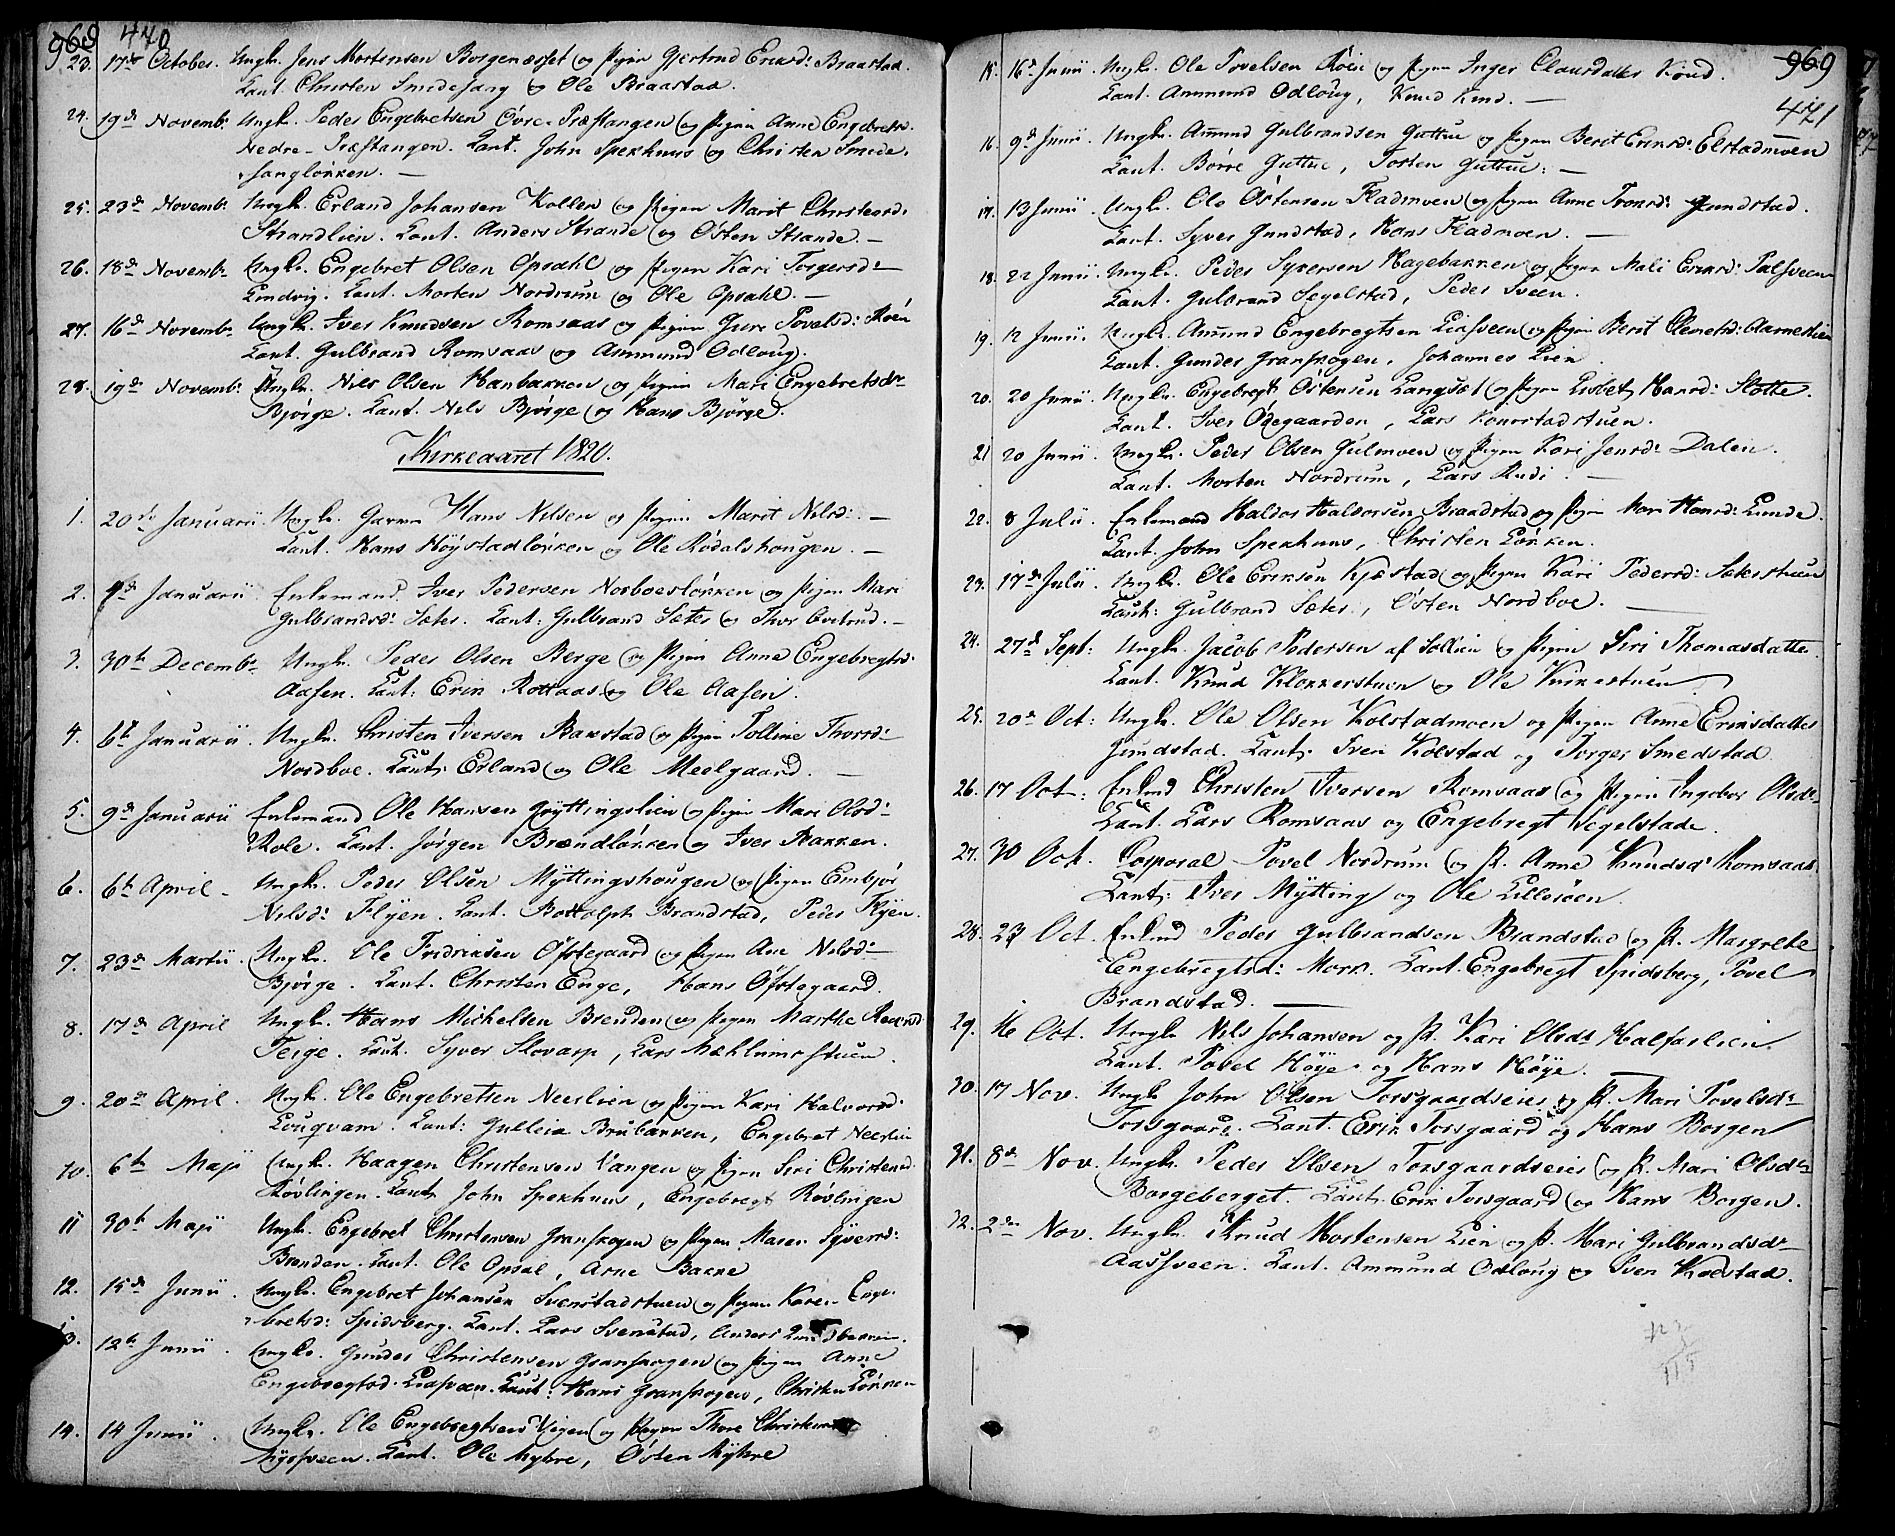 SAH, Ringebu prestekontor, Ministerialbok nr. 3, 1781-1820, s. 470-471